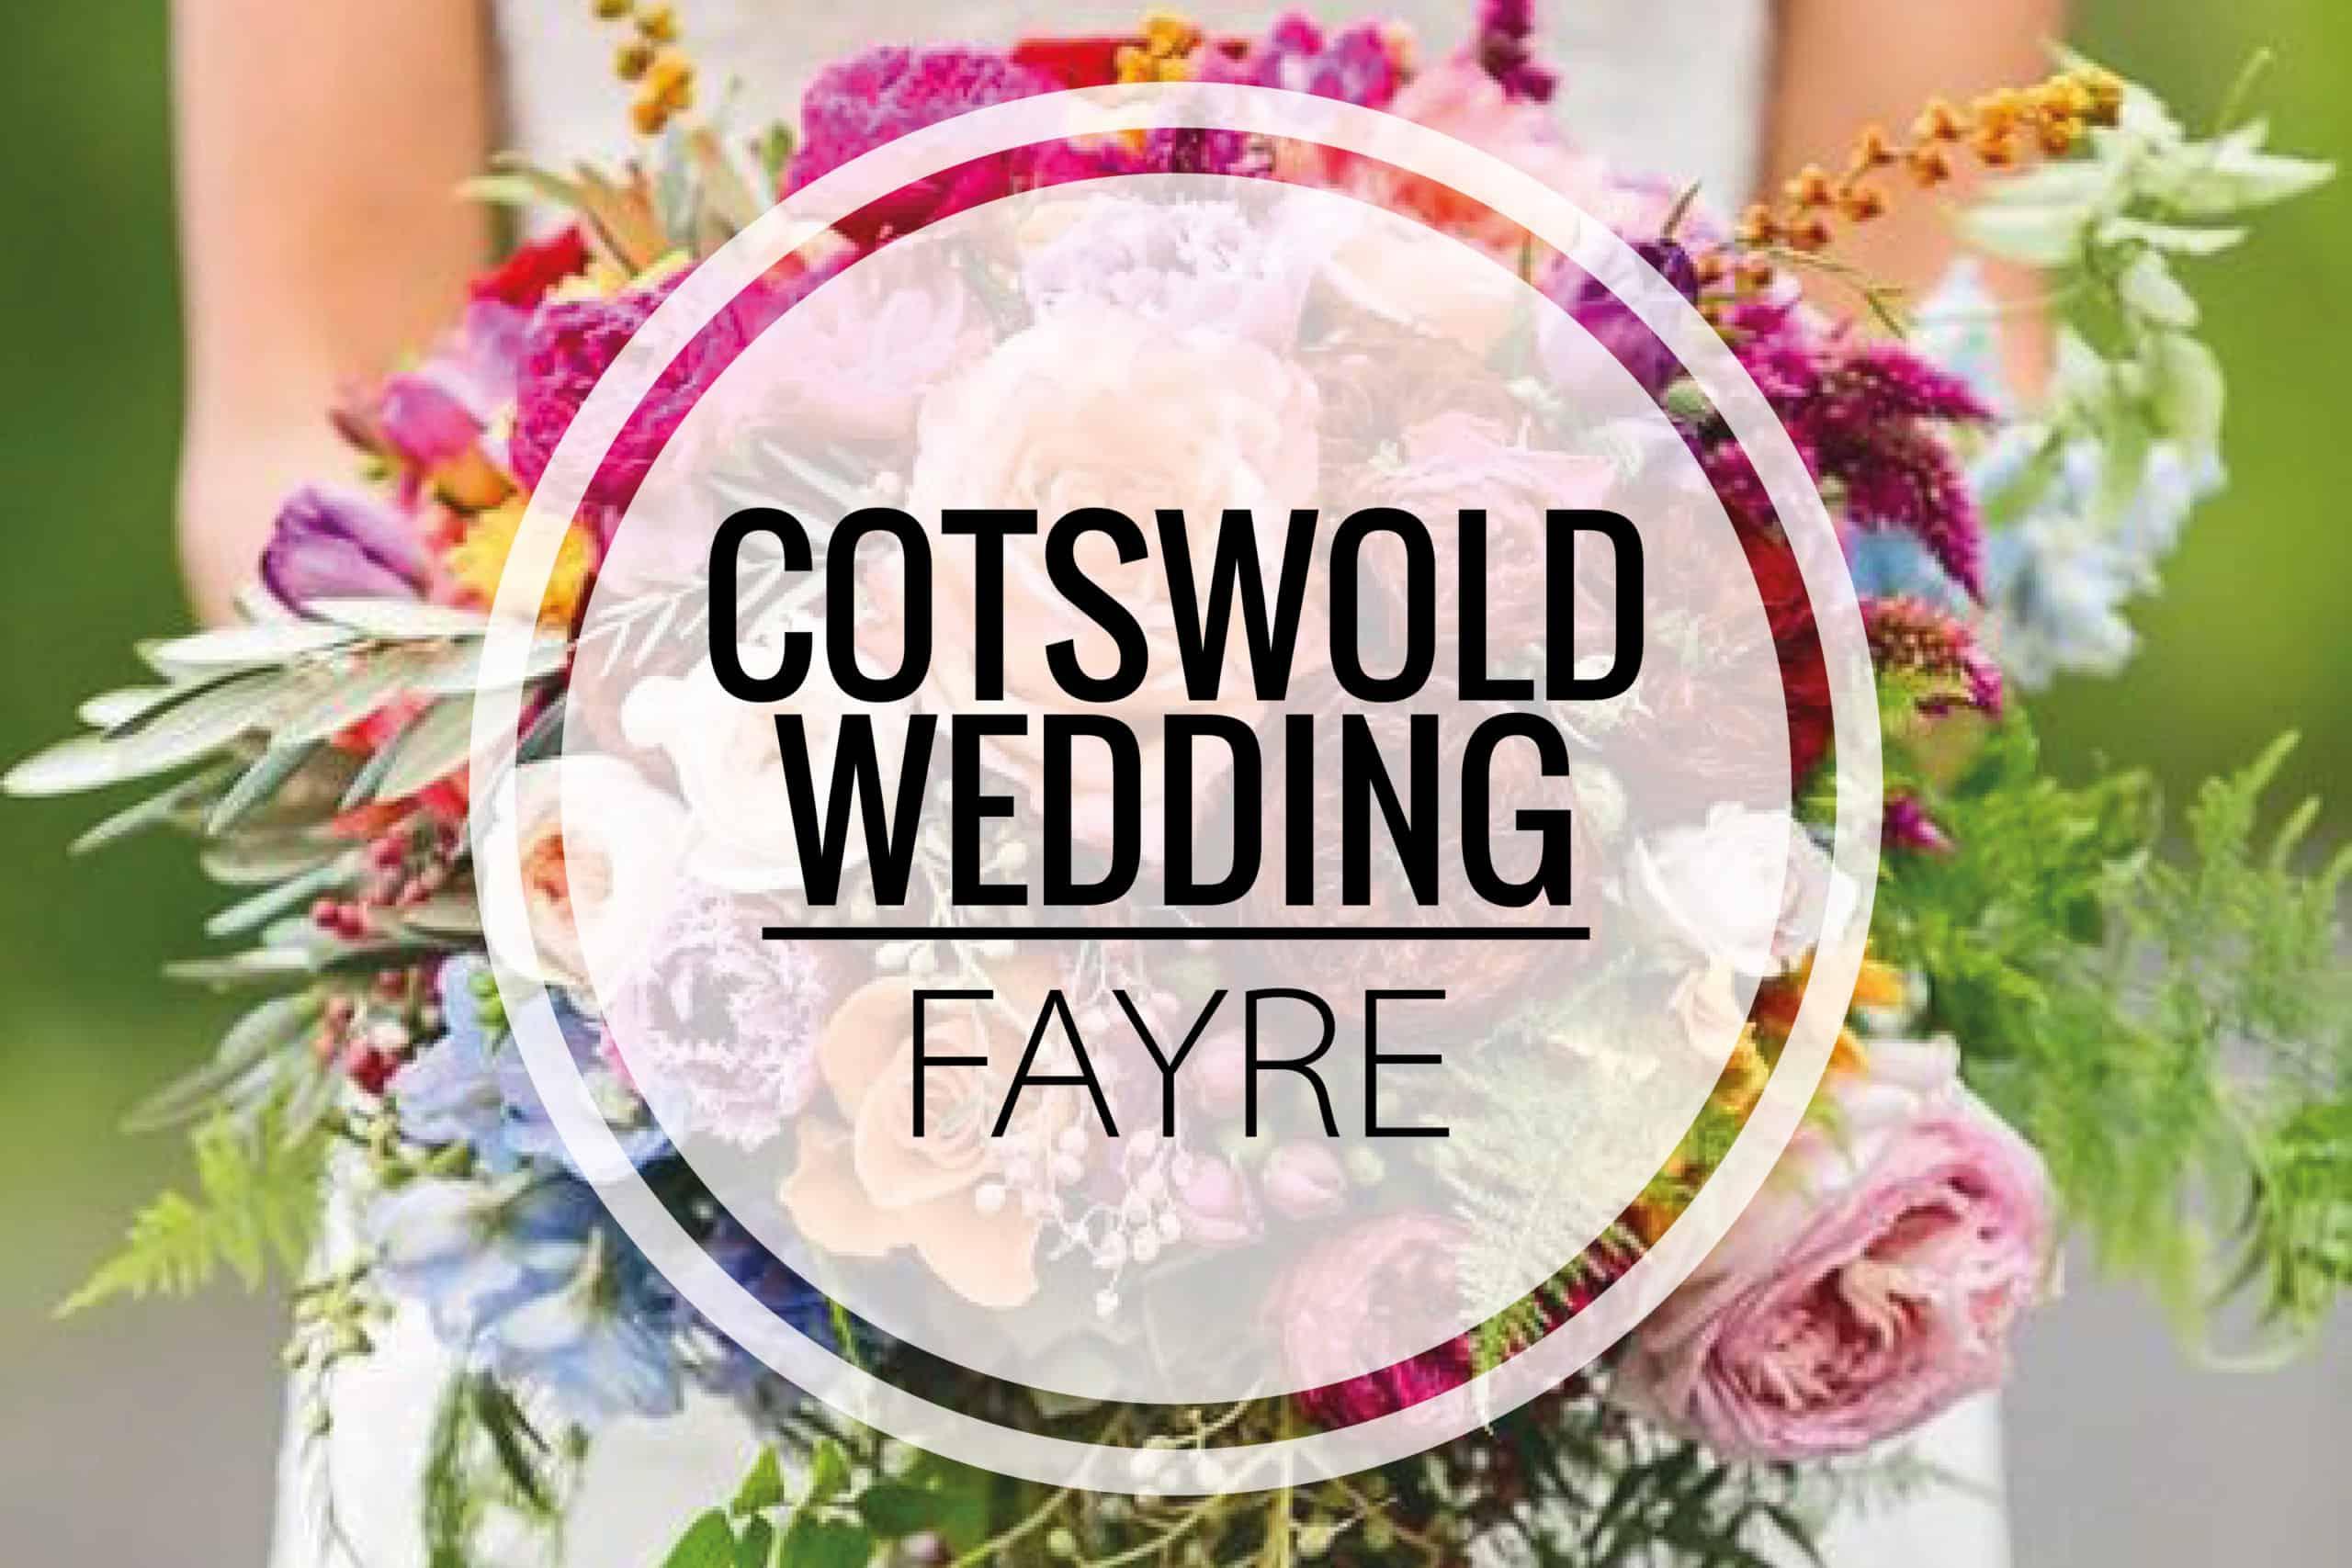 Wedding Fayre Cotswold Wedding Fayre